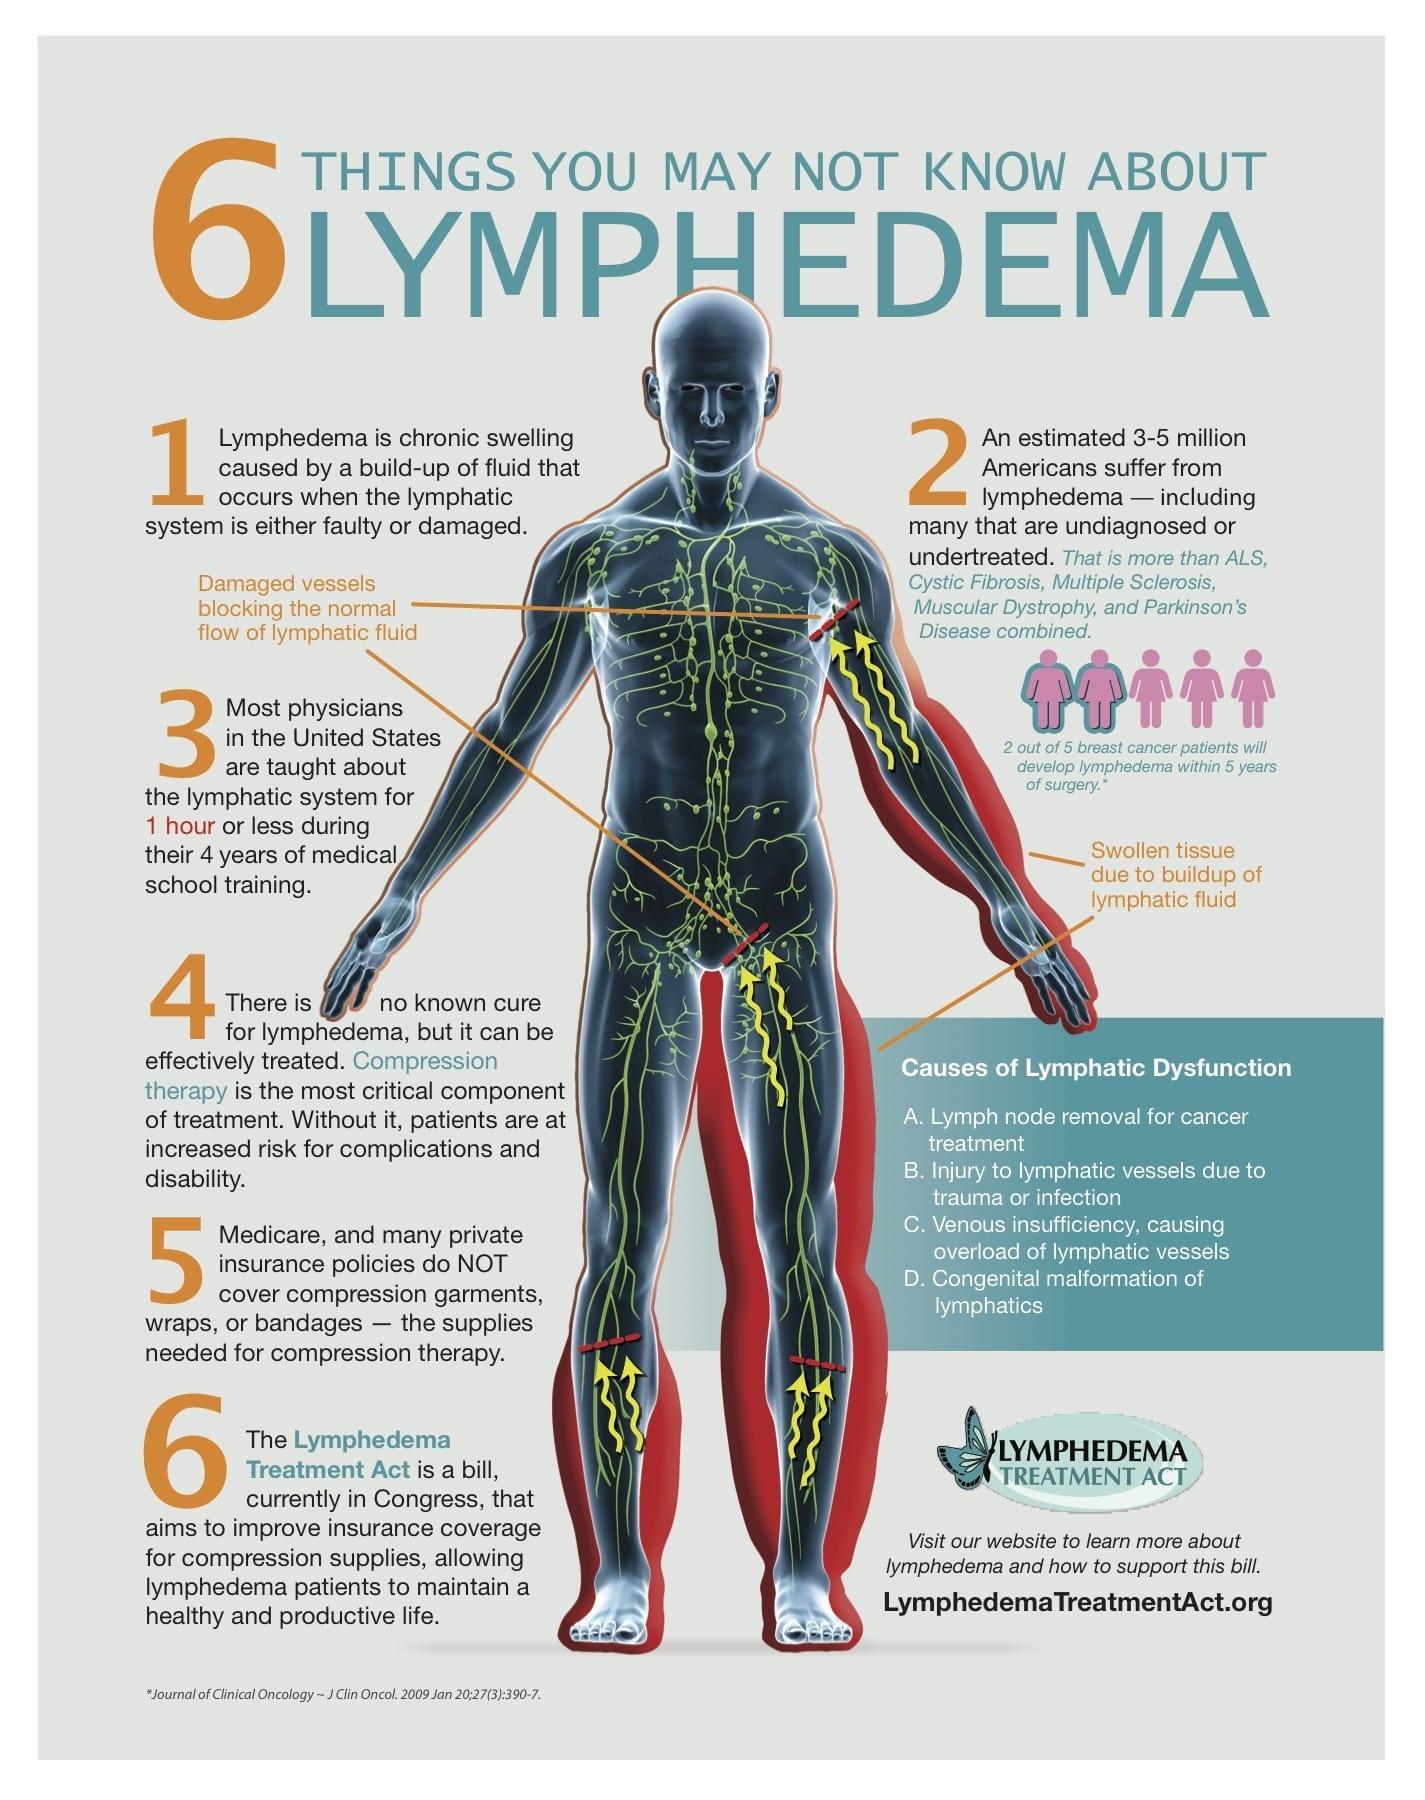 Lymphedema Treatment Act